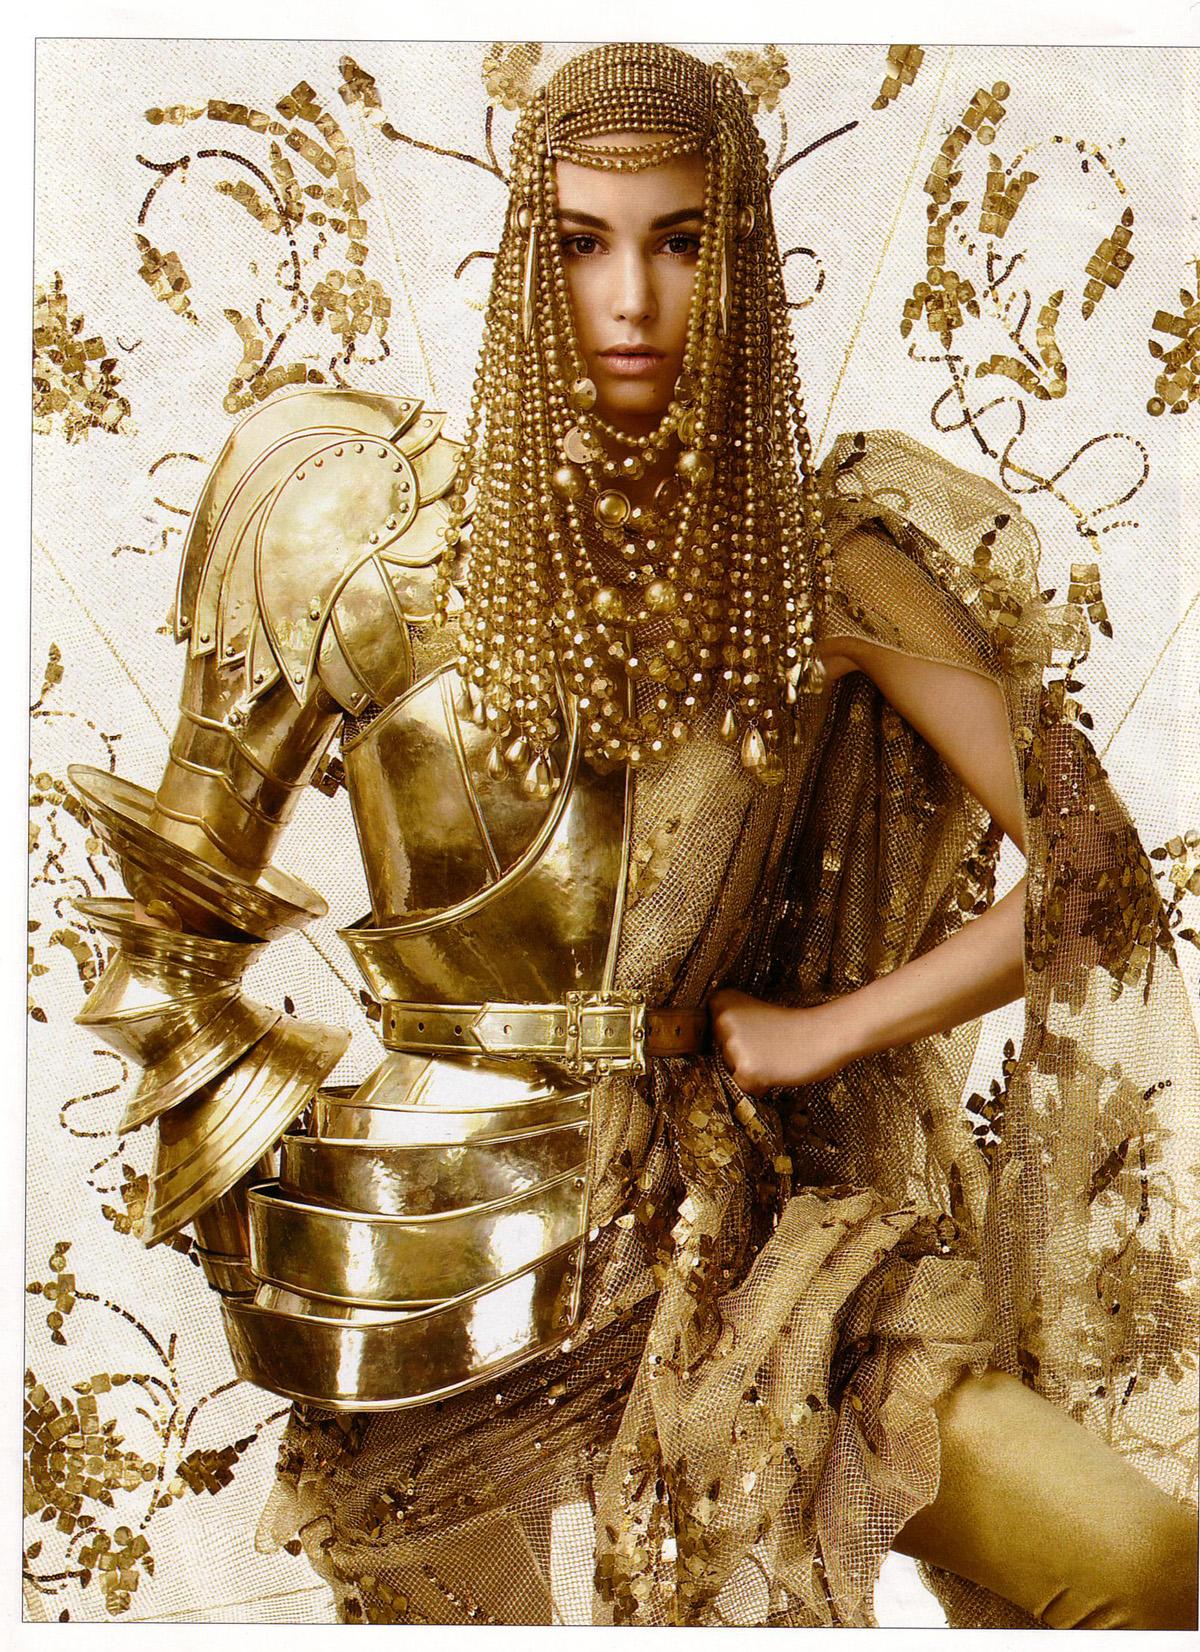 Aphrodite art and fashion Farewell to Antigonish - Aphrodite Art and Fashion